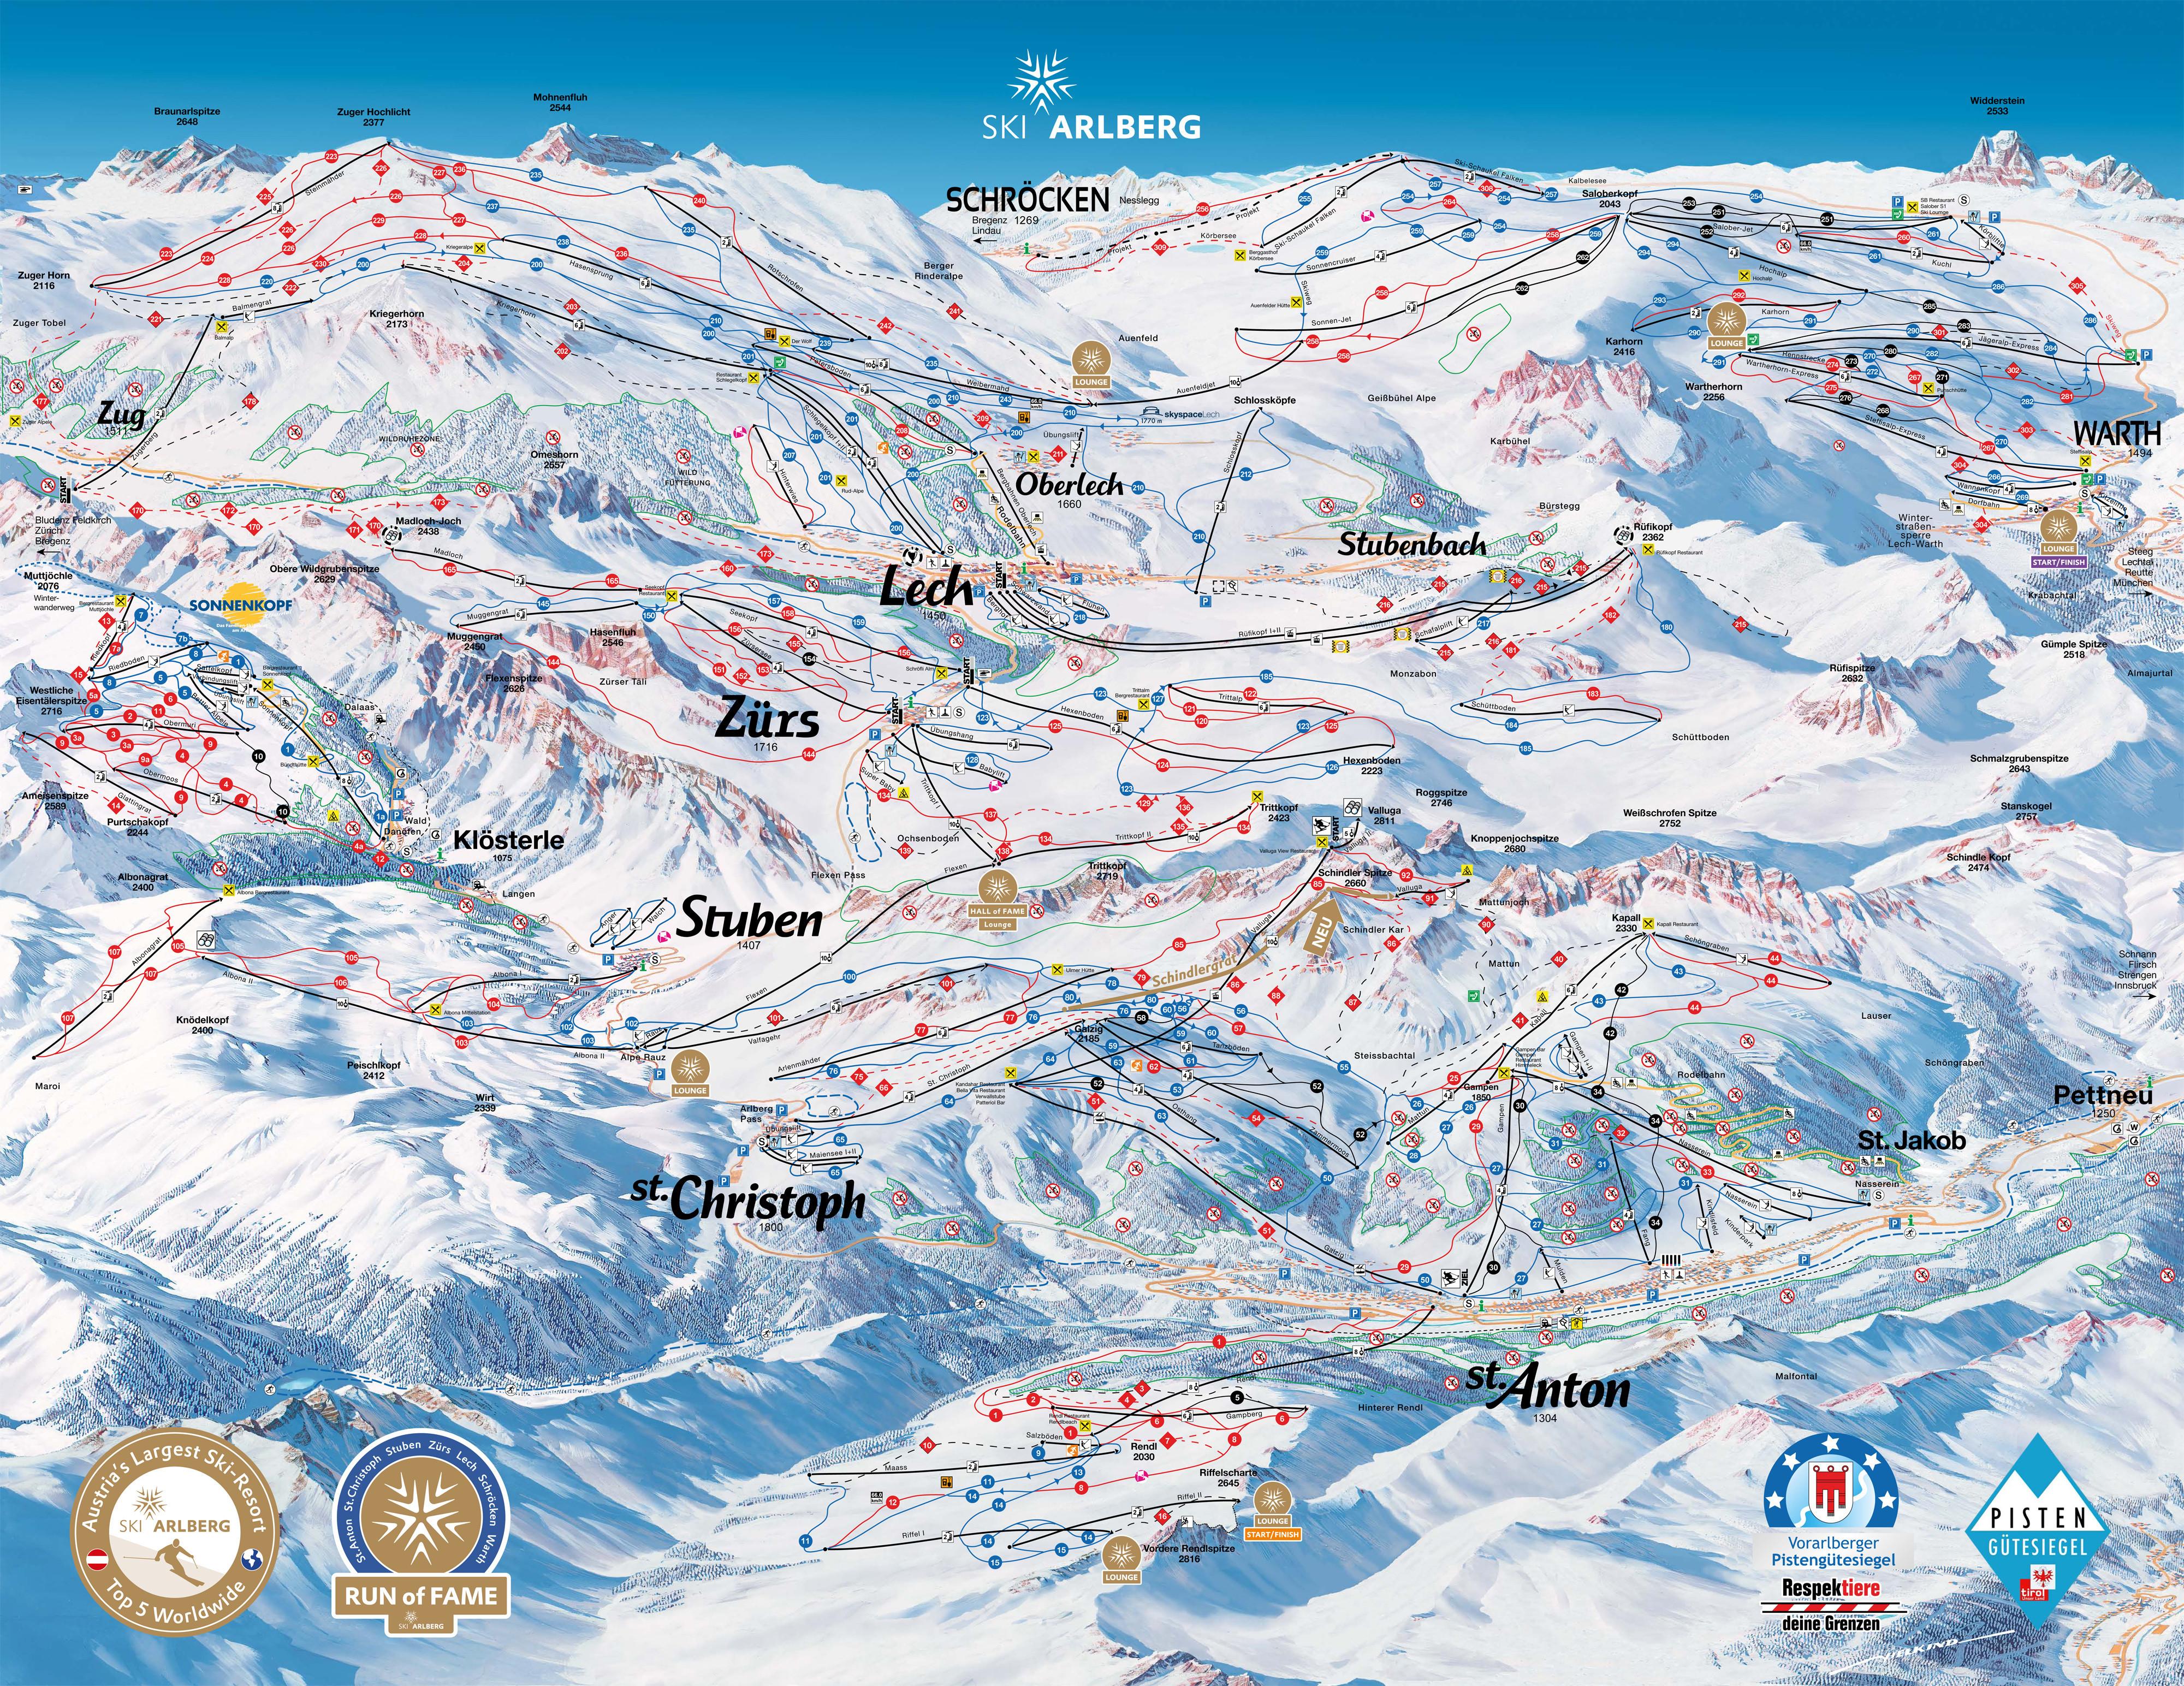 Pistenplan von St. Anton (Ski Arlberg)